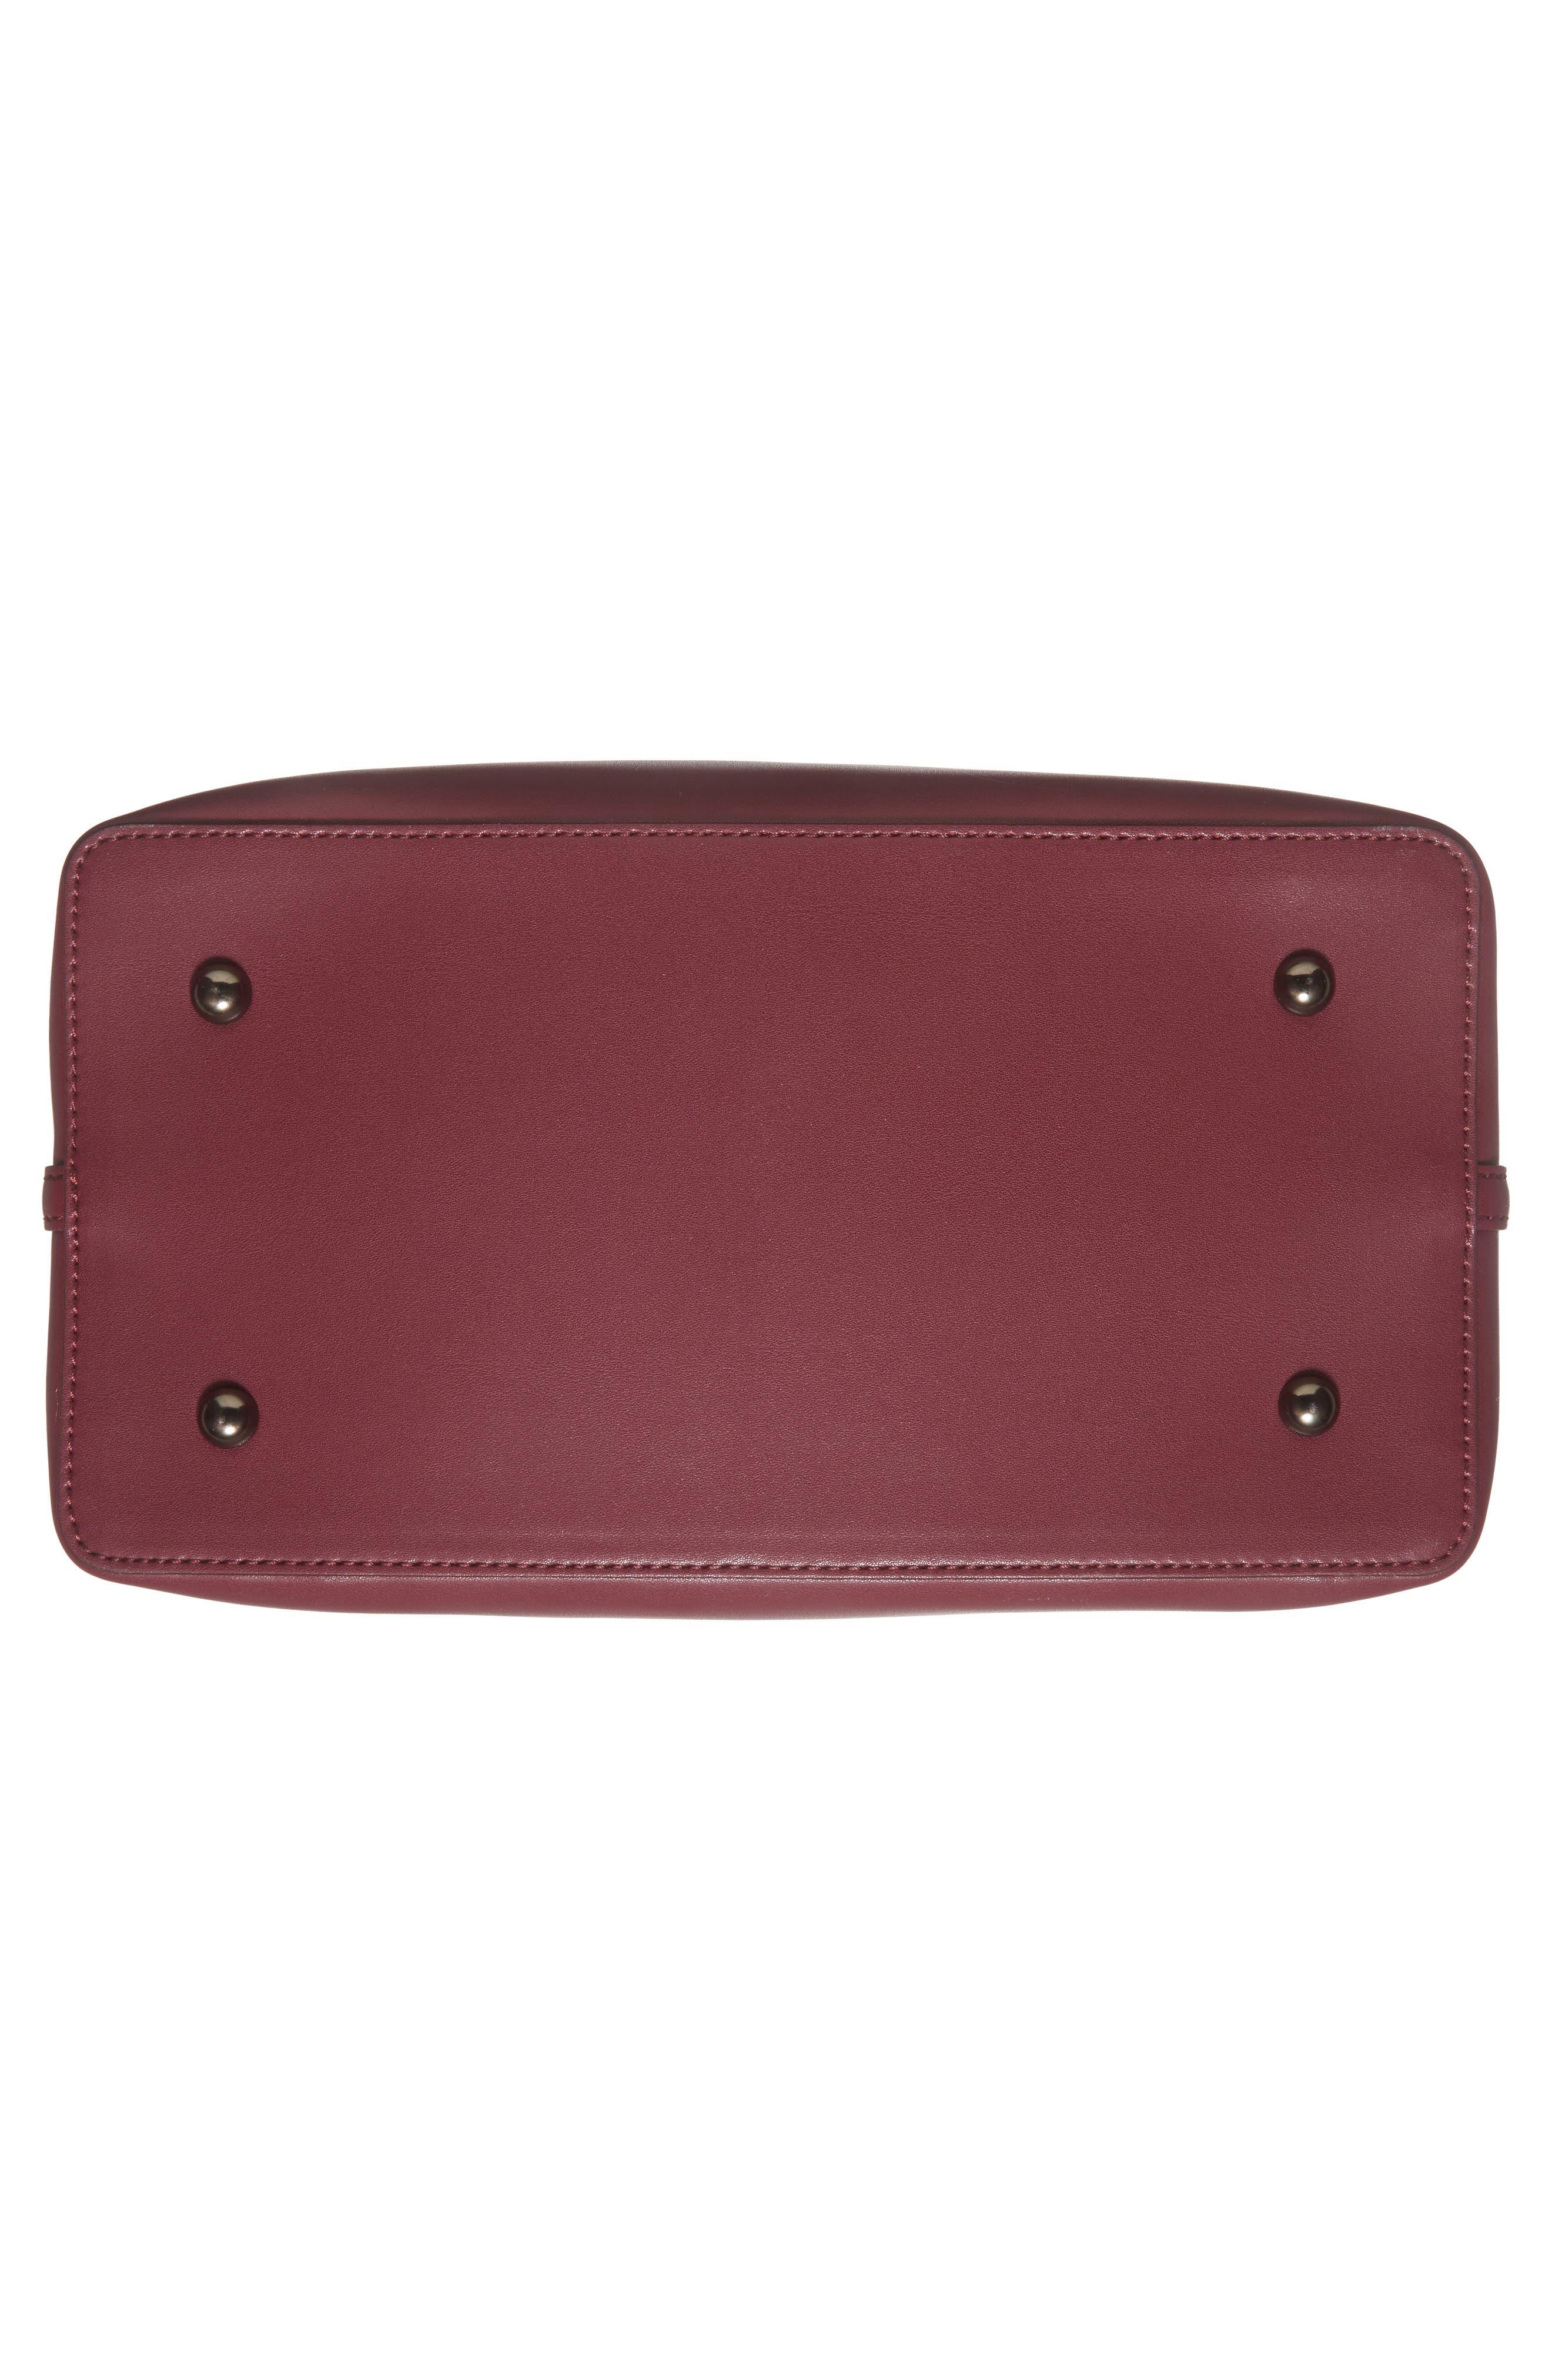 Raisin Leather Handbag,                             Alternate thumbnail 48, color,